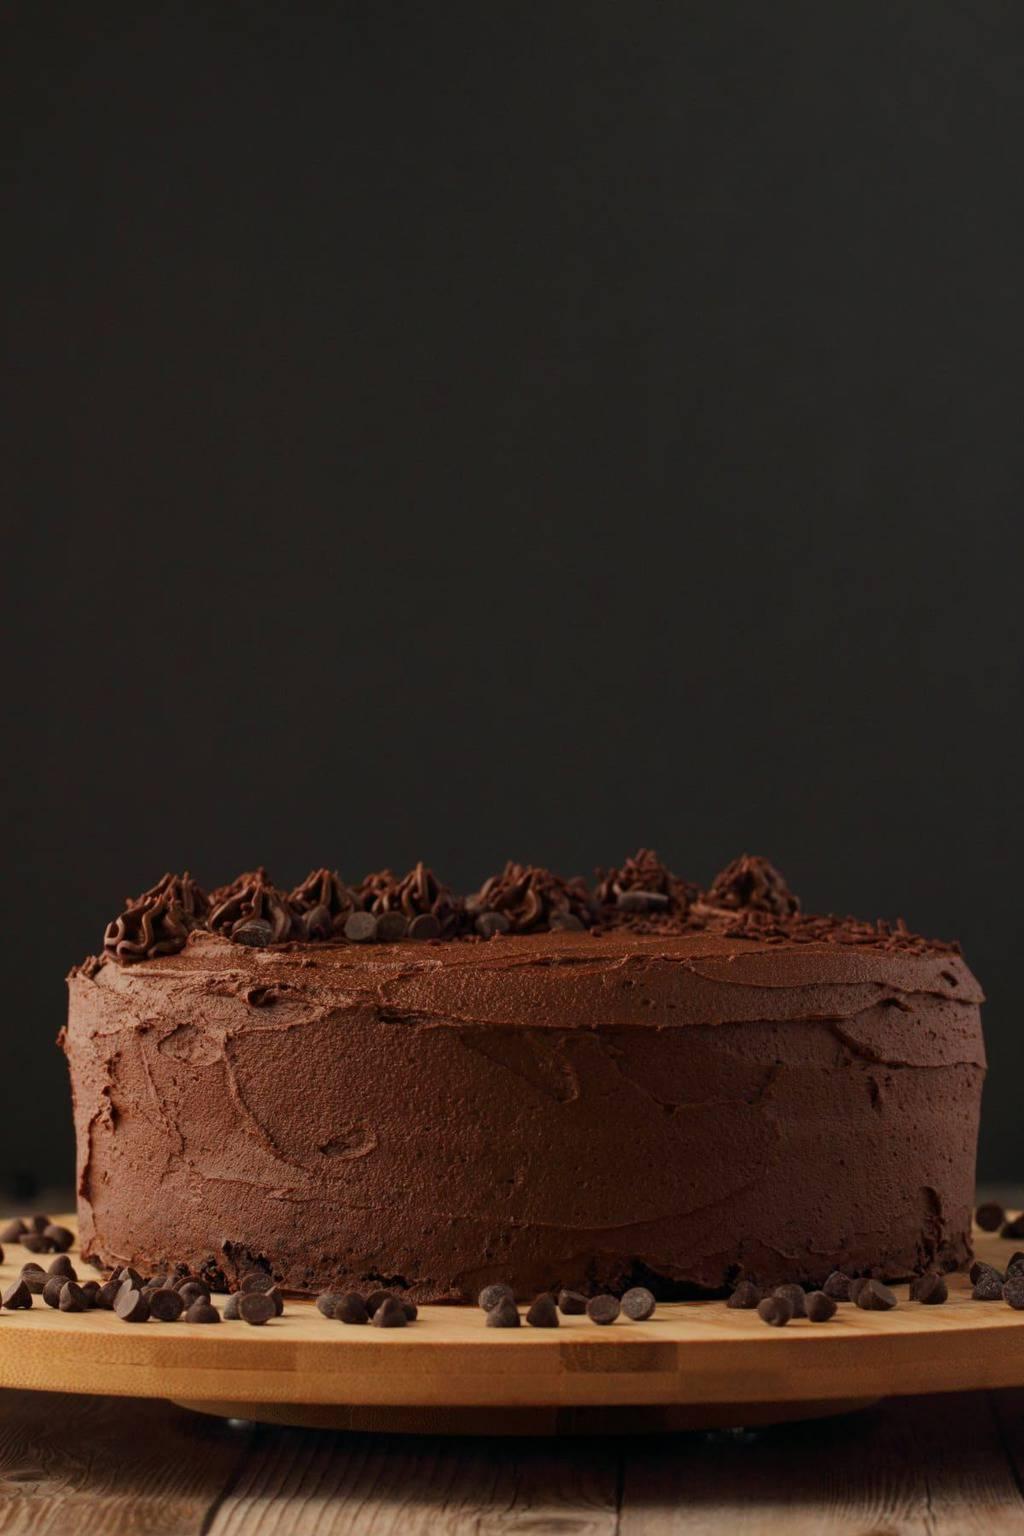 Vegan Chocolate Zucchini Cake on a wooden board.